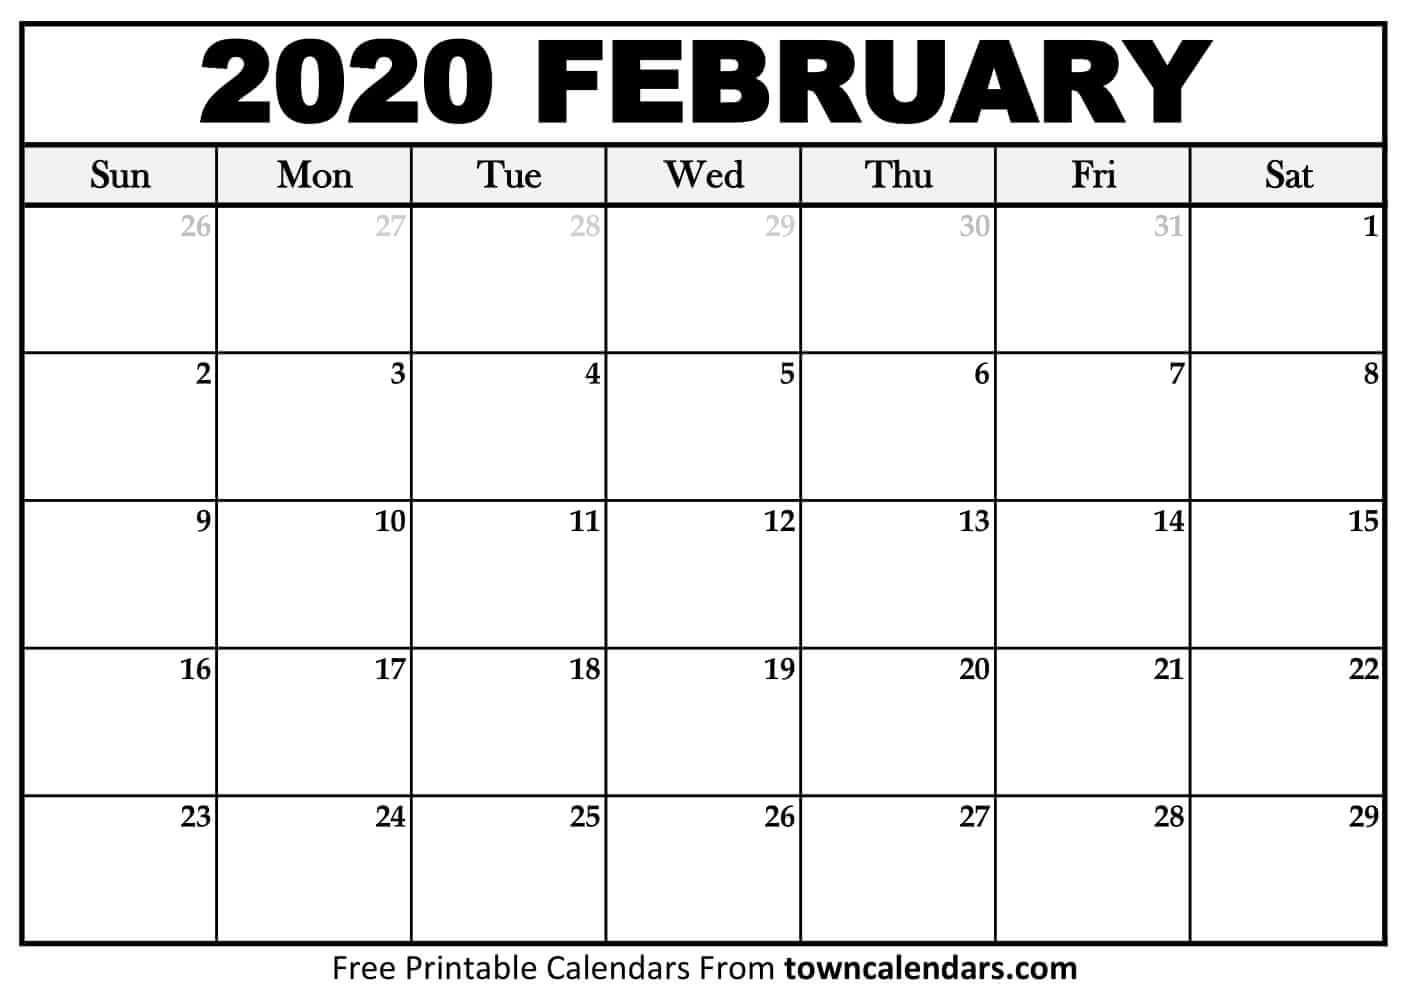 Printable February 2020 Calendar - Towncalendars  February 2020 Calendar Printable